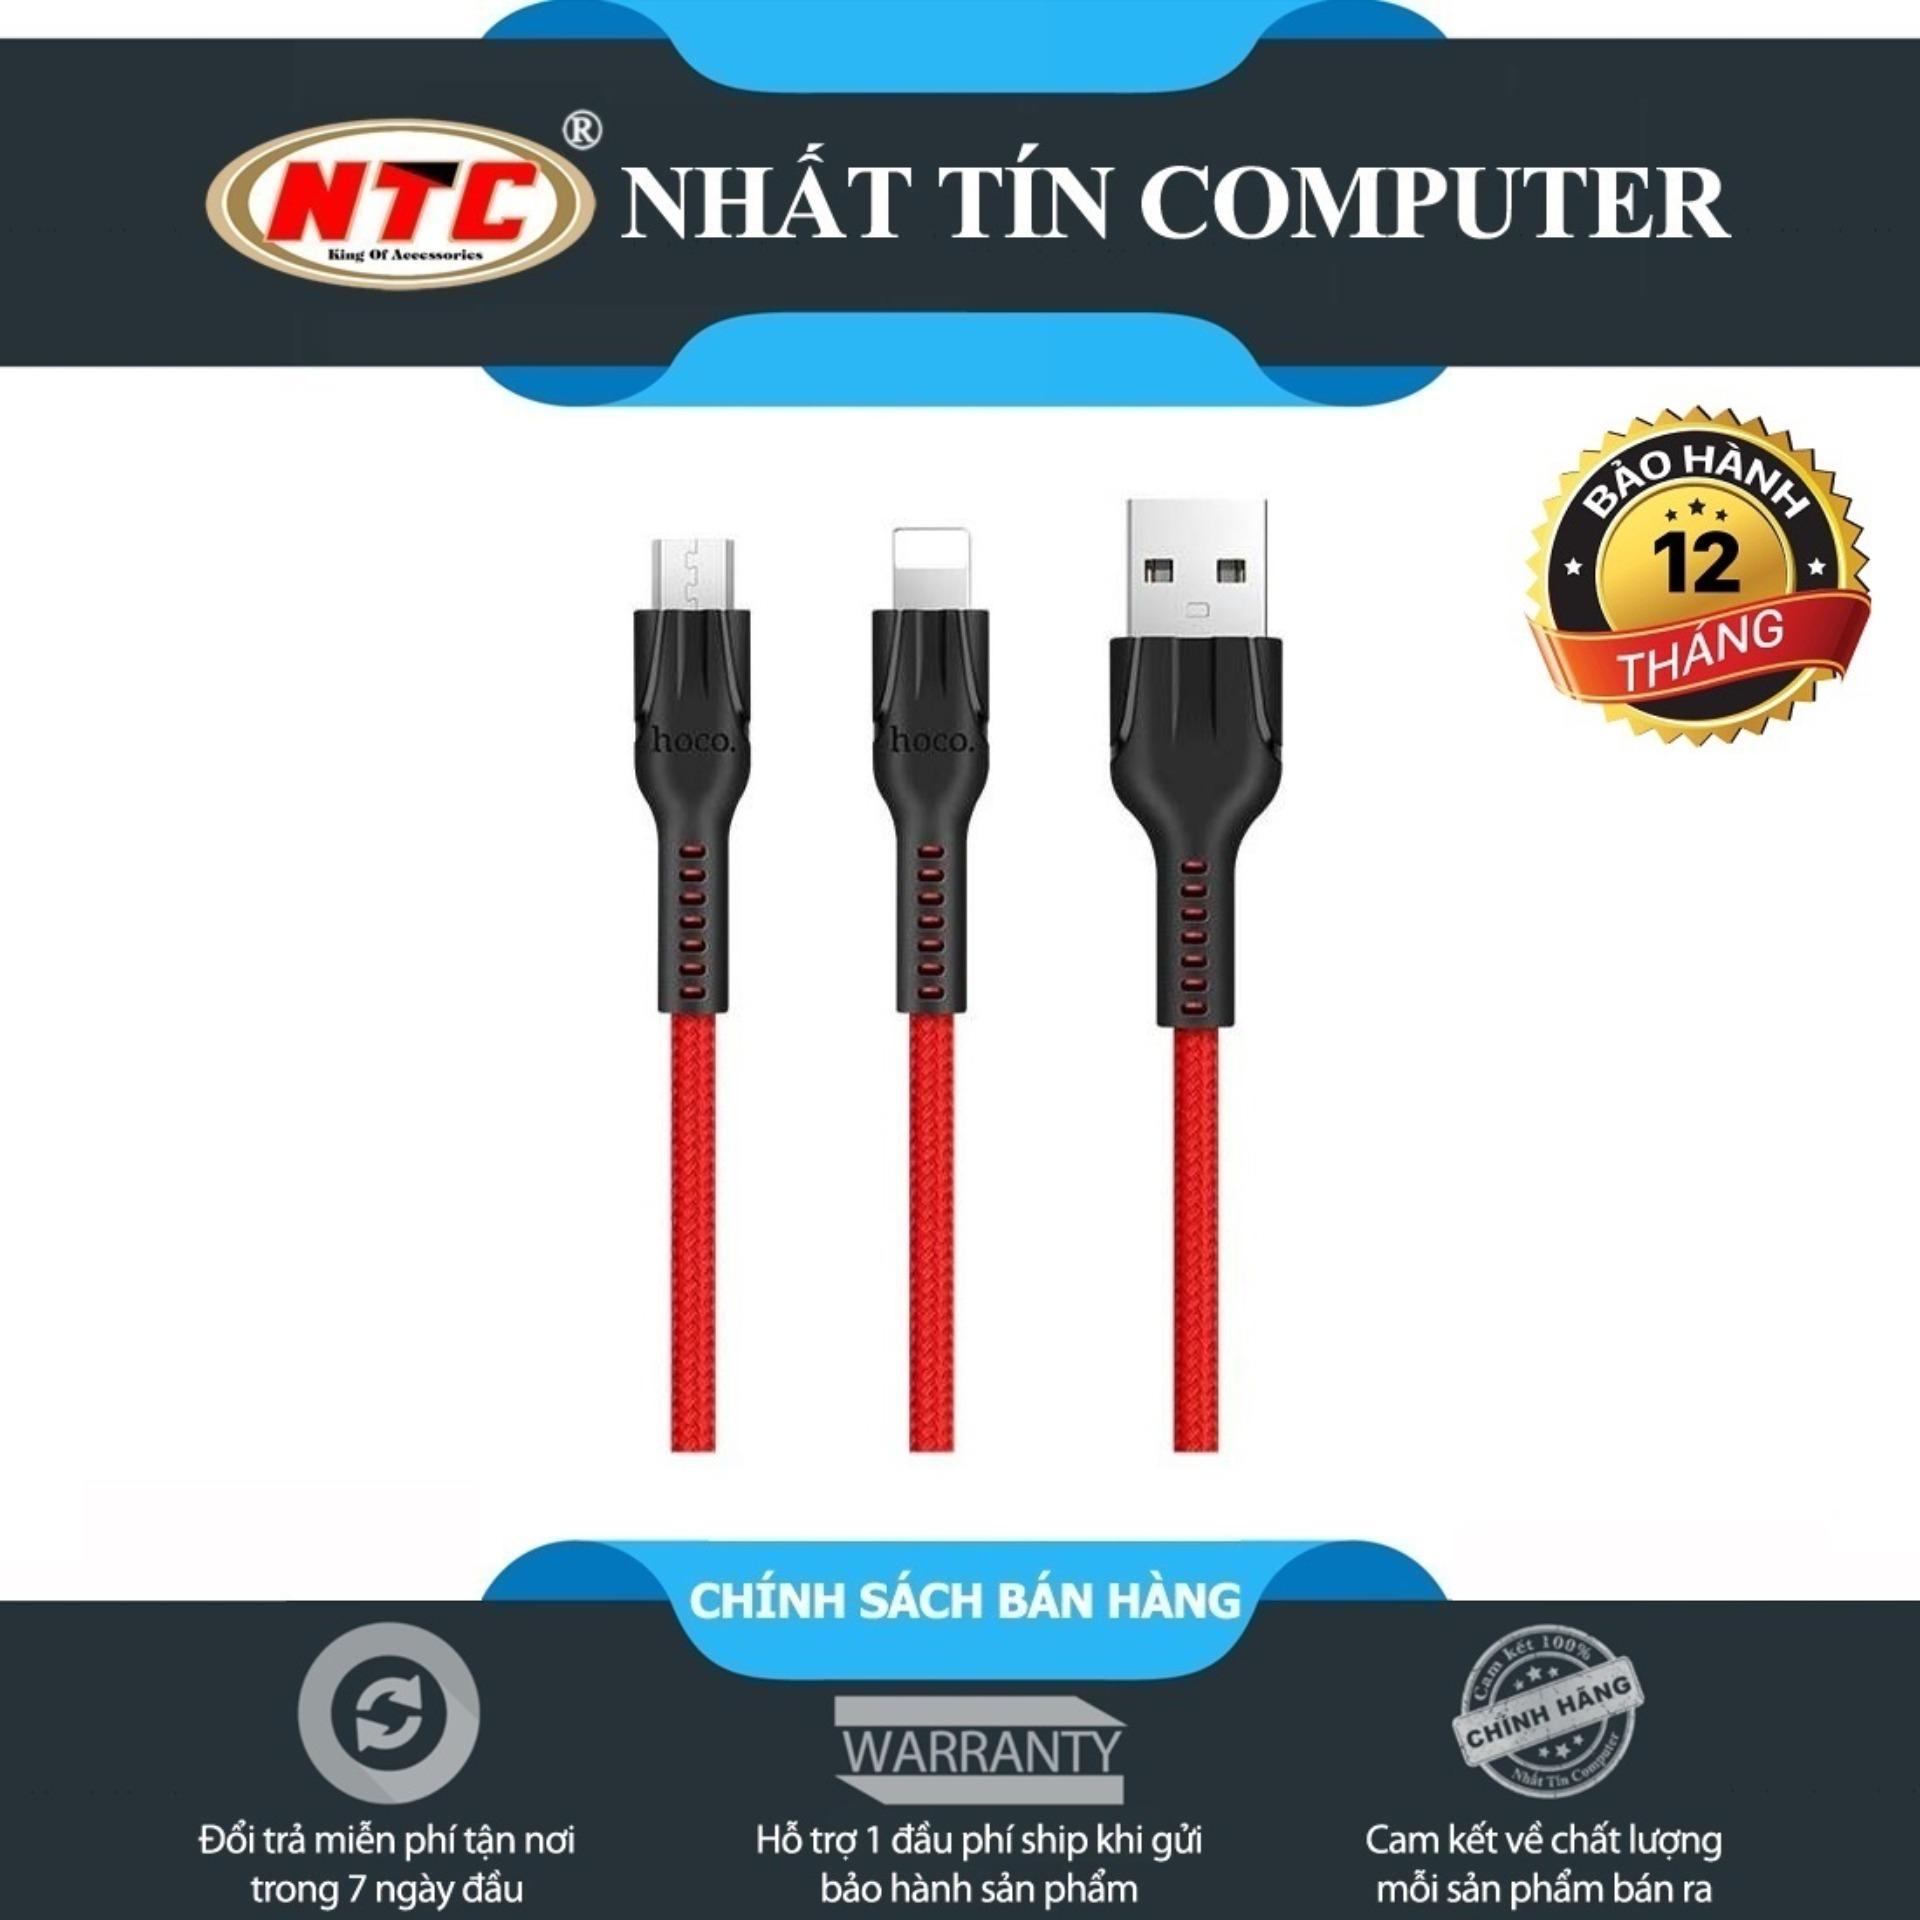 Cp Sc 3 U Earldom Et 877 2 Microusb 1 Lightning Bc Cable Universal In With Micro Usb Cao Hoco U31 Benay Di 12m V Hng Phn Phi Chnh Thc